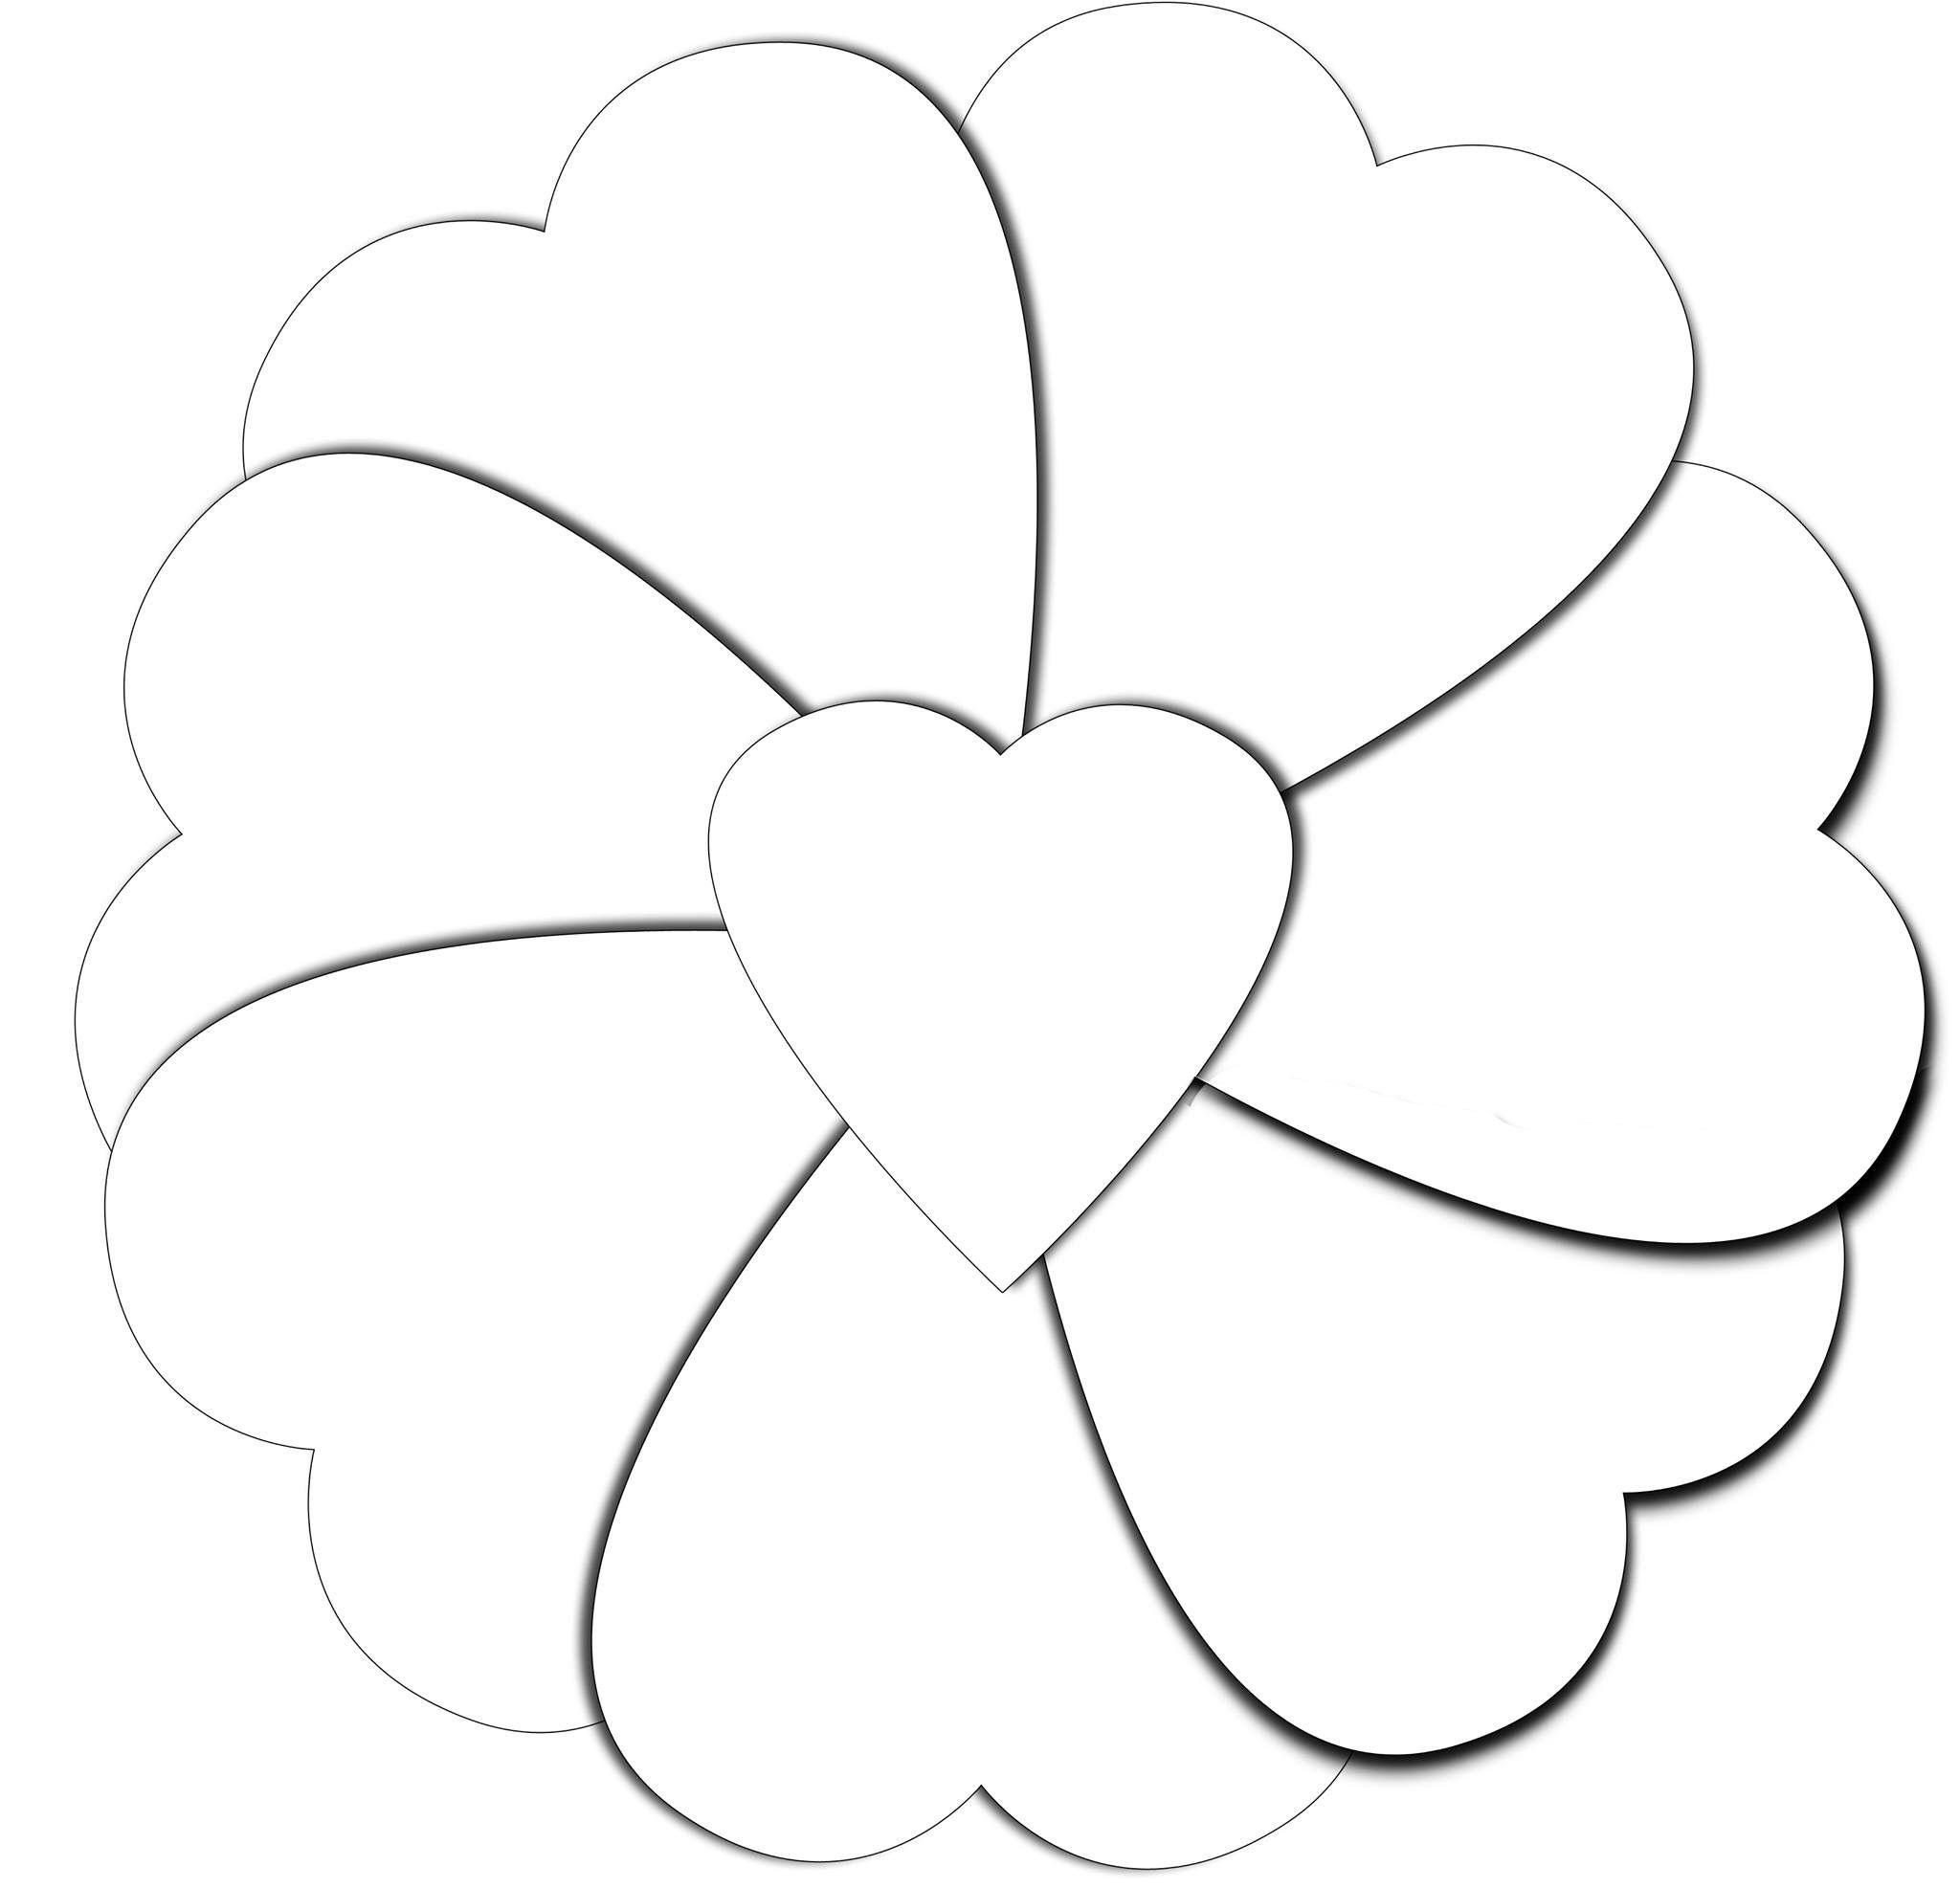 Pin de Carmen Argüello en corazones-heart-valentines | Pinterest ...